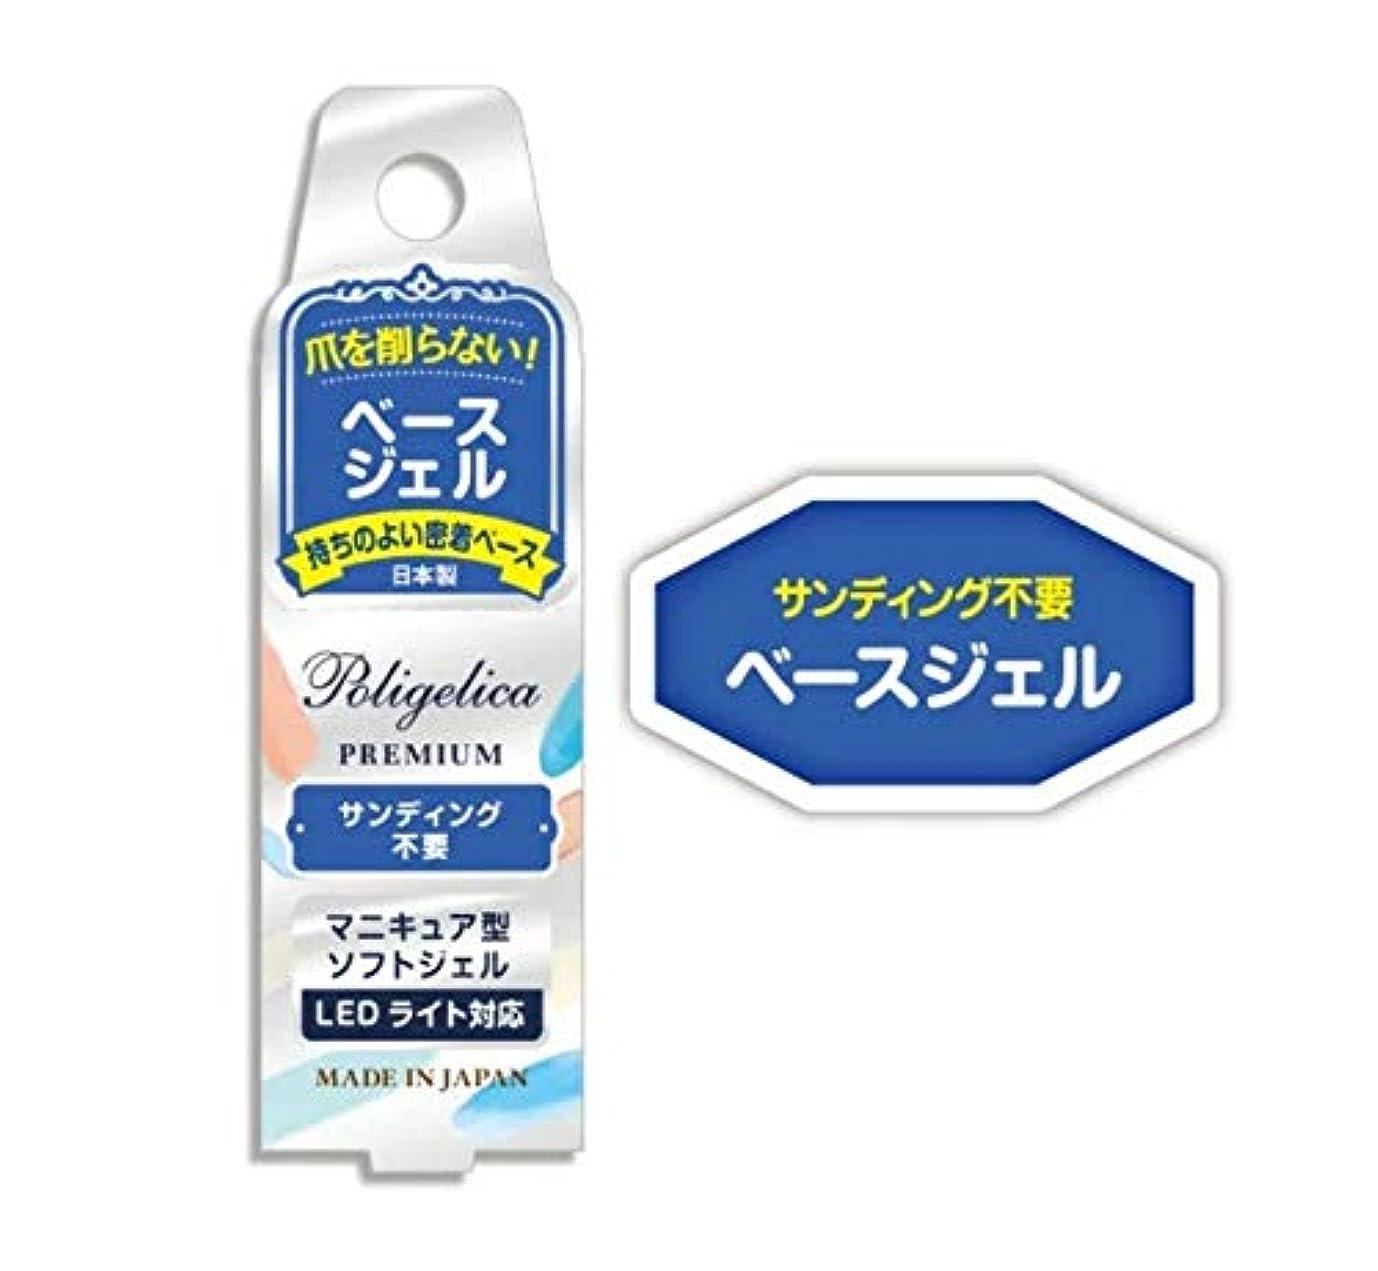 BWポリジェリカ プレミアムベースジェル 6g APGB1001 日本製 ソフト ジェル ネイル サンディング不要 爪 密着 マニキュア型